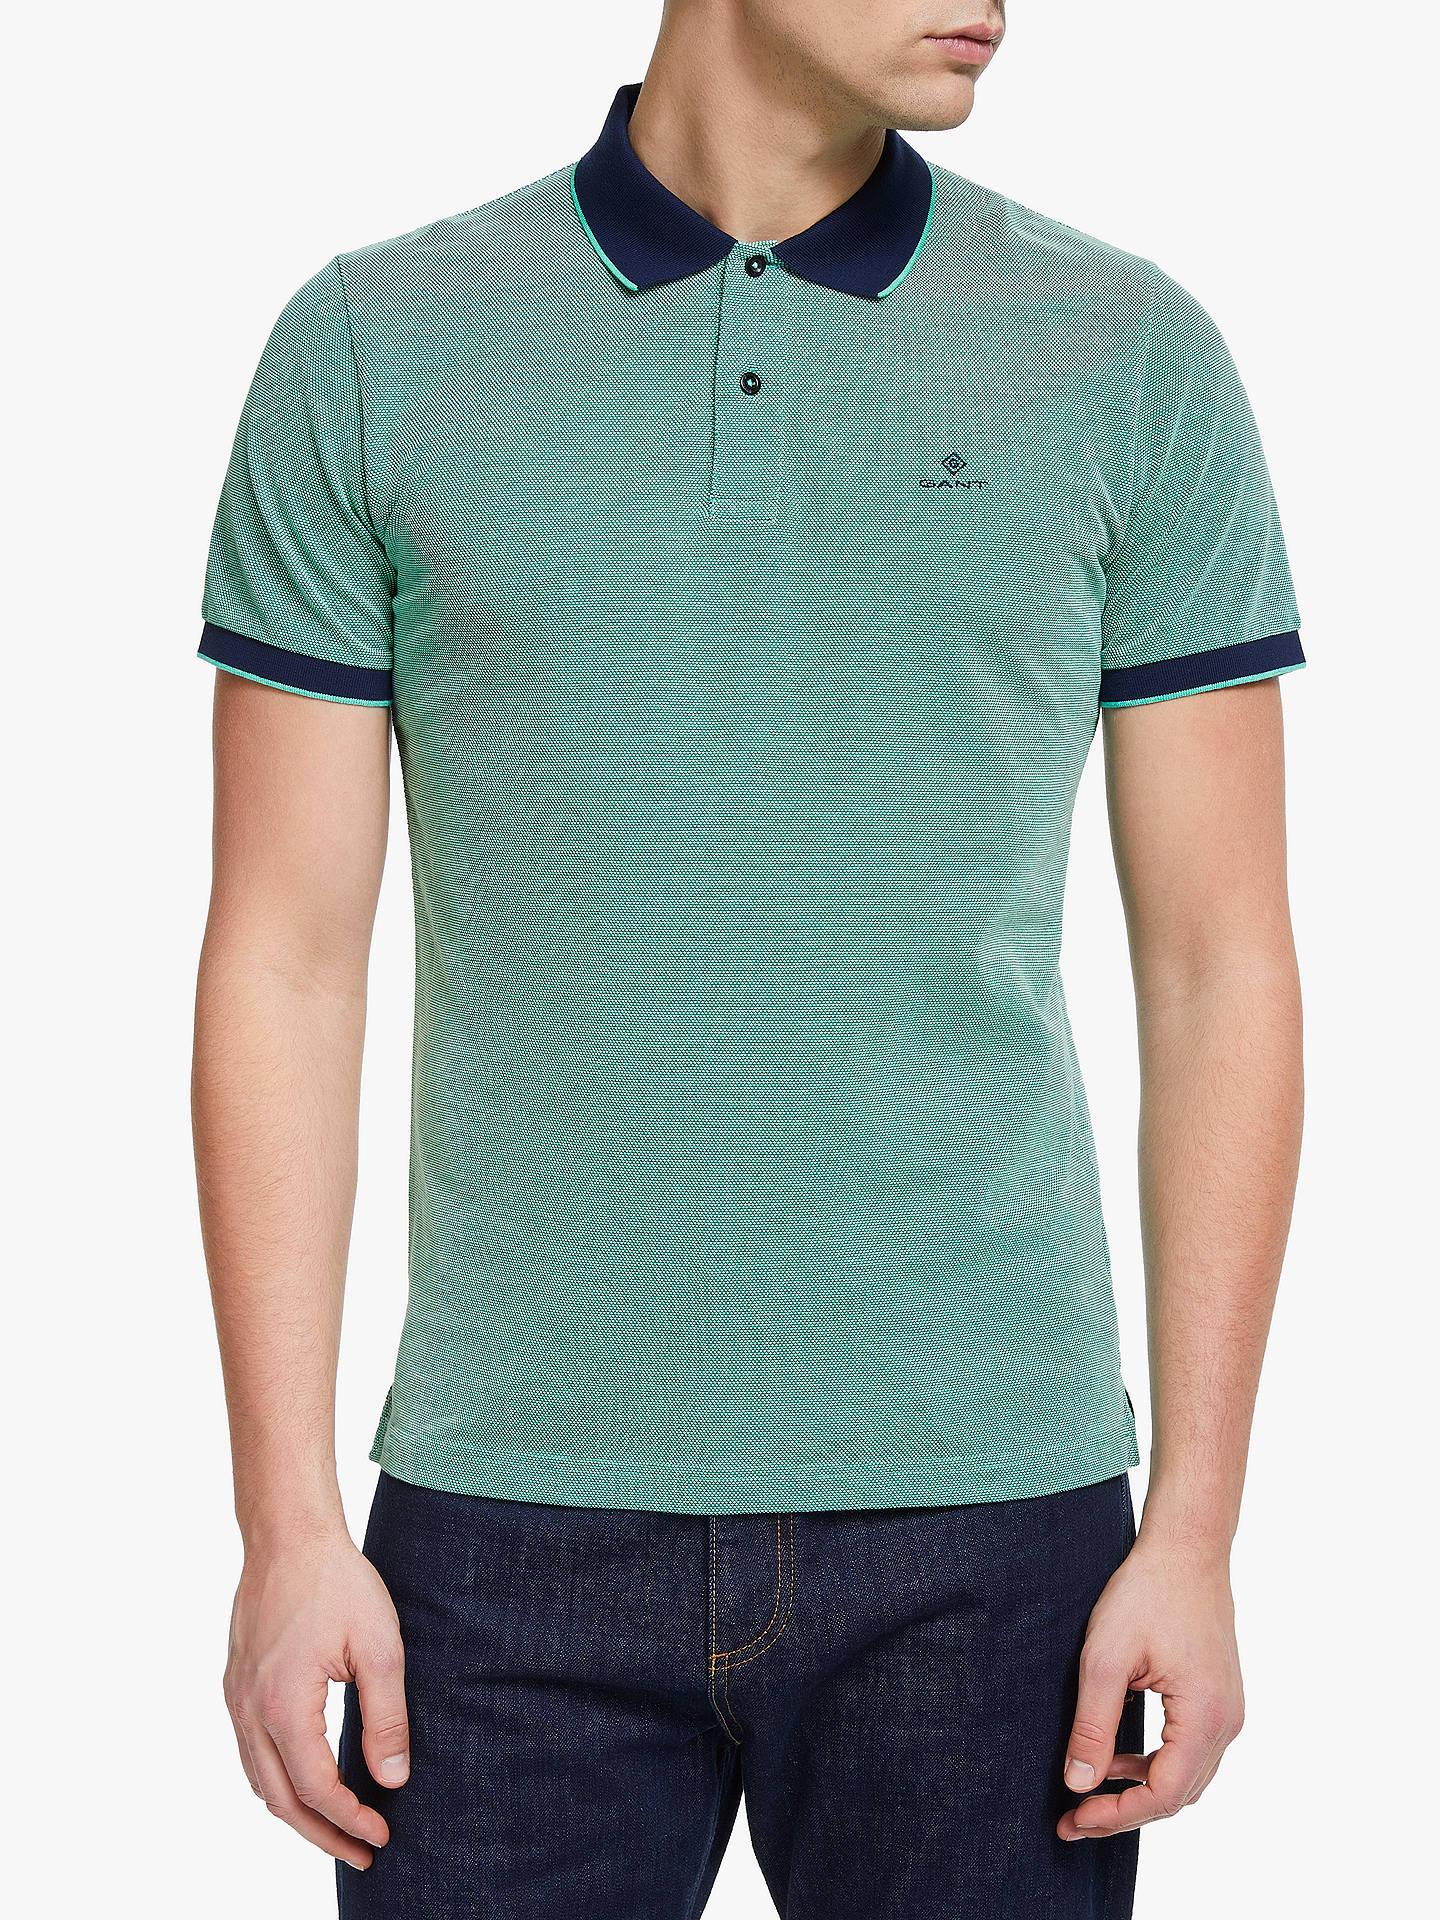 97c54dbc51 Smart Casual Polo Shirts - DREAMWORKS